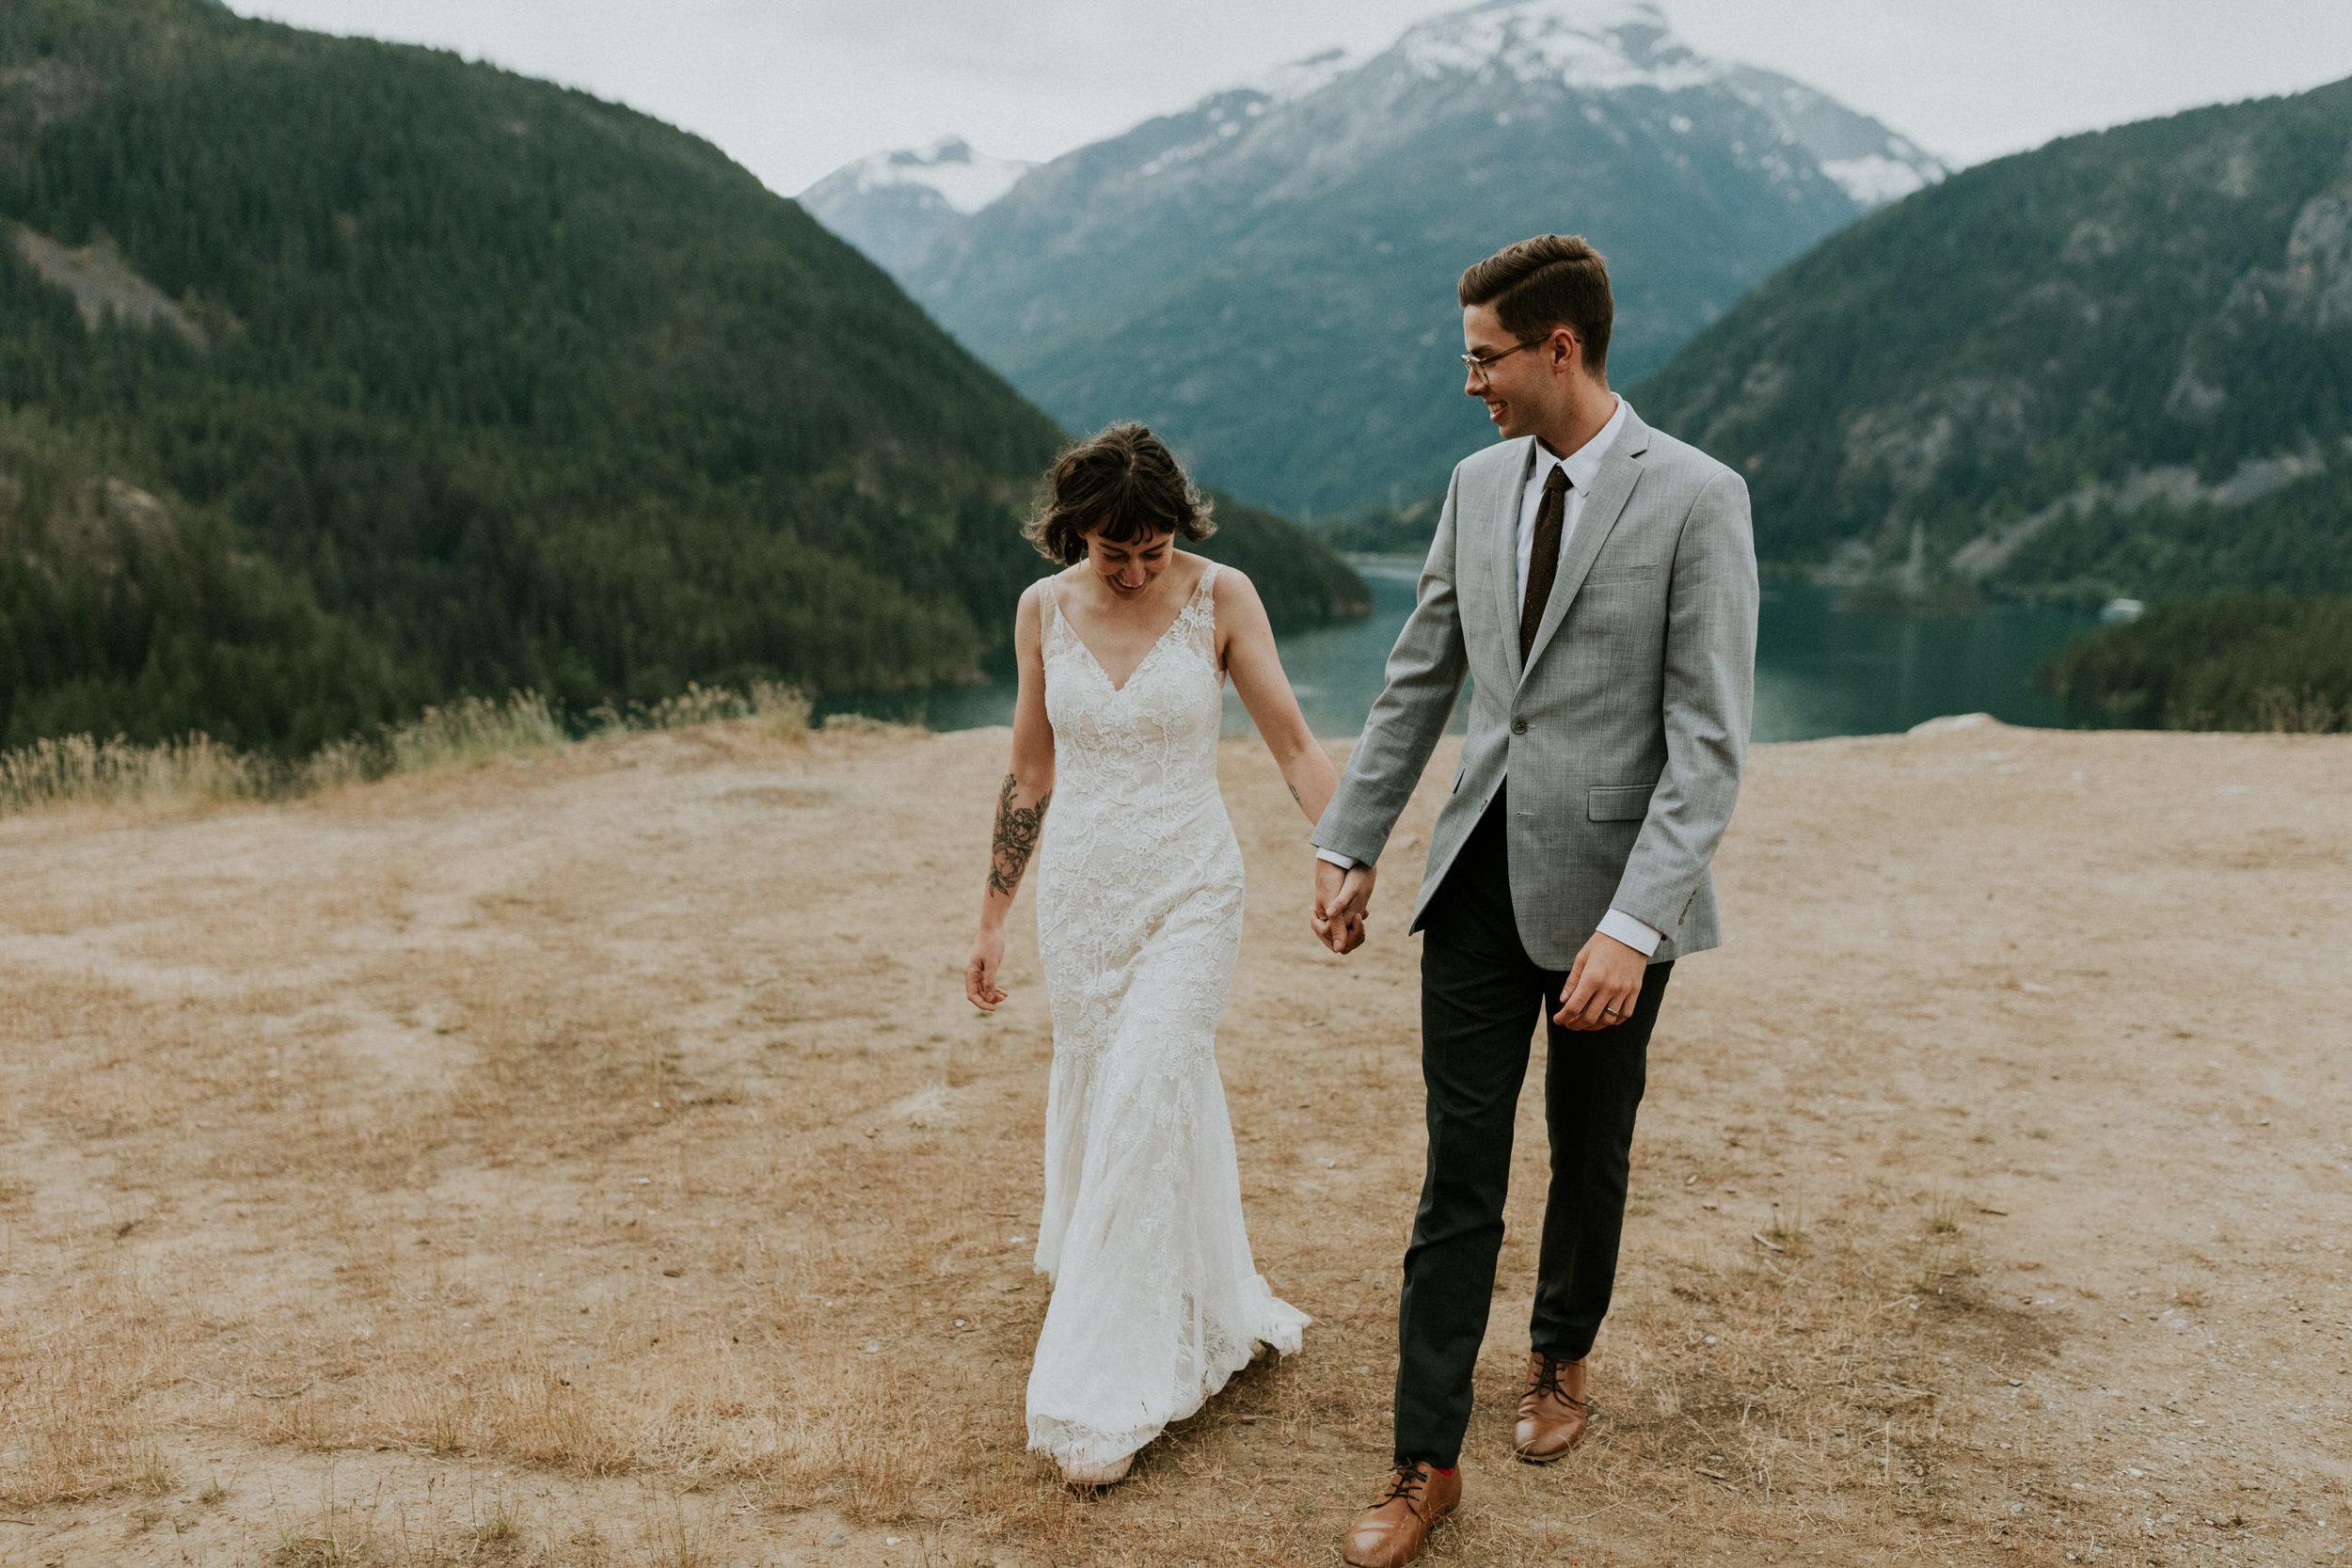 Ellie&Matt-wedding-seattle-diablolake43.jpg